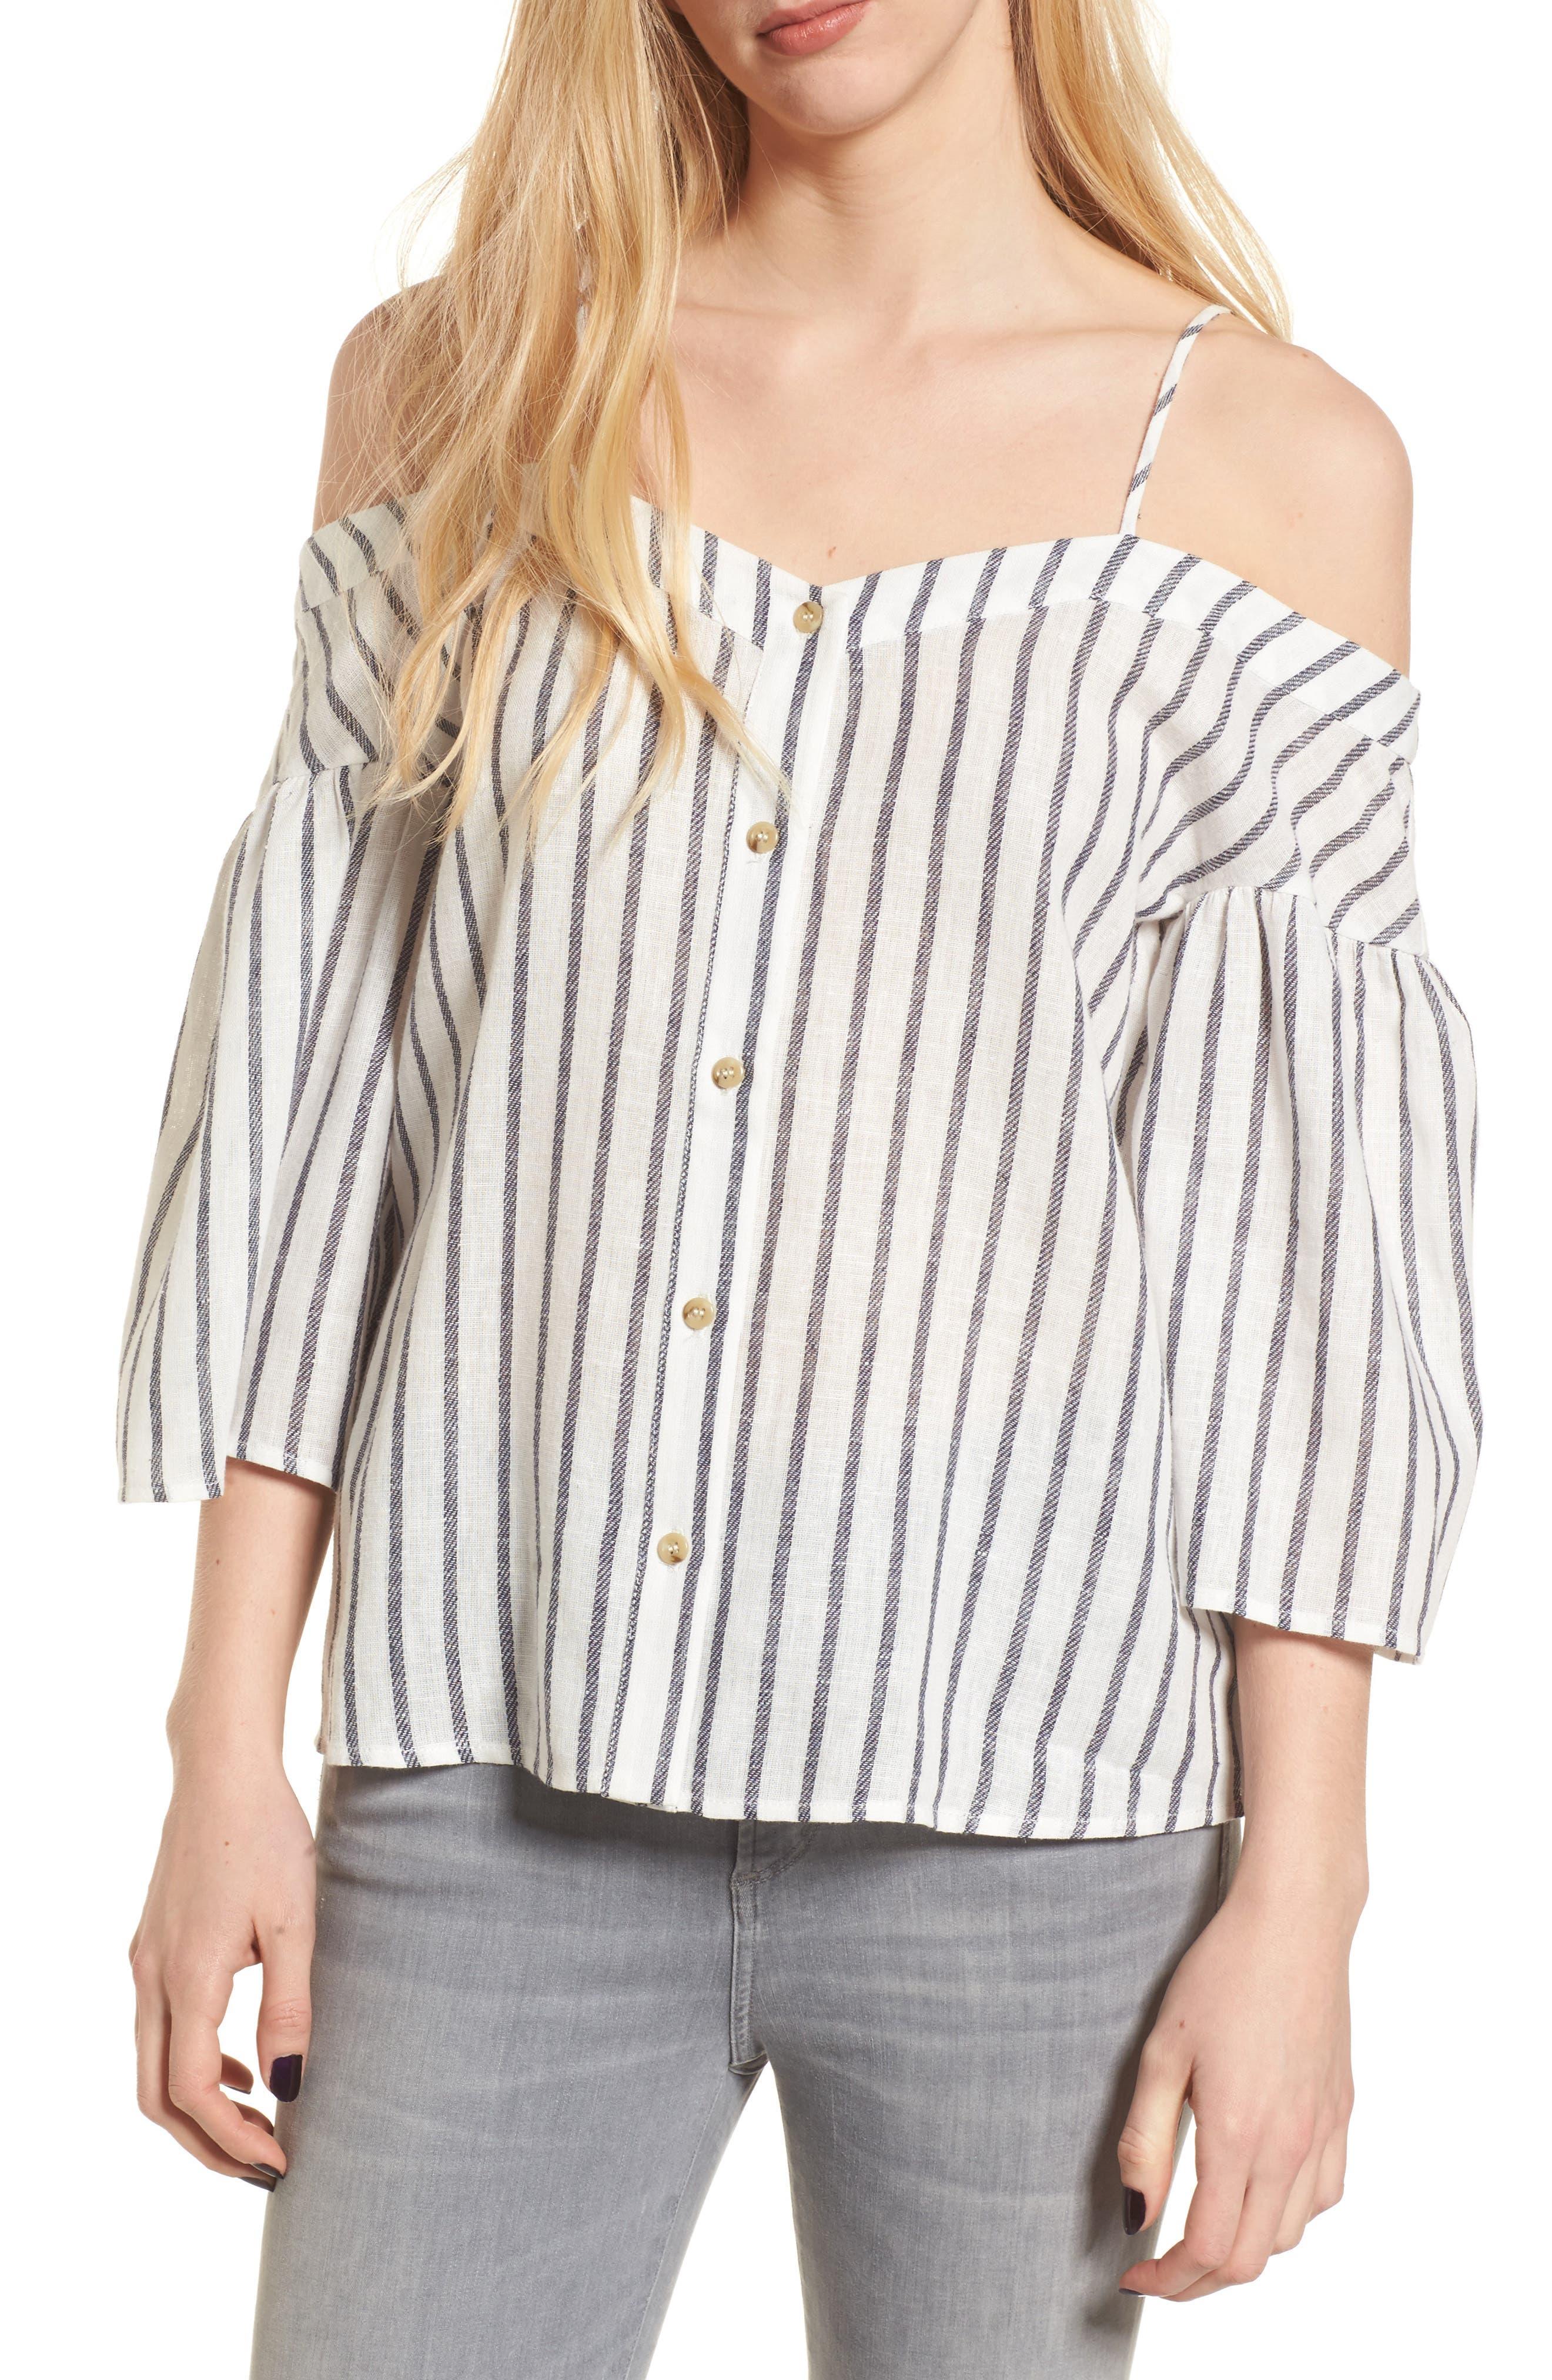 Main Image - BP. Stripe Off the Shoulder Top